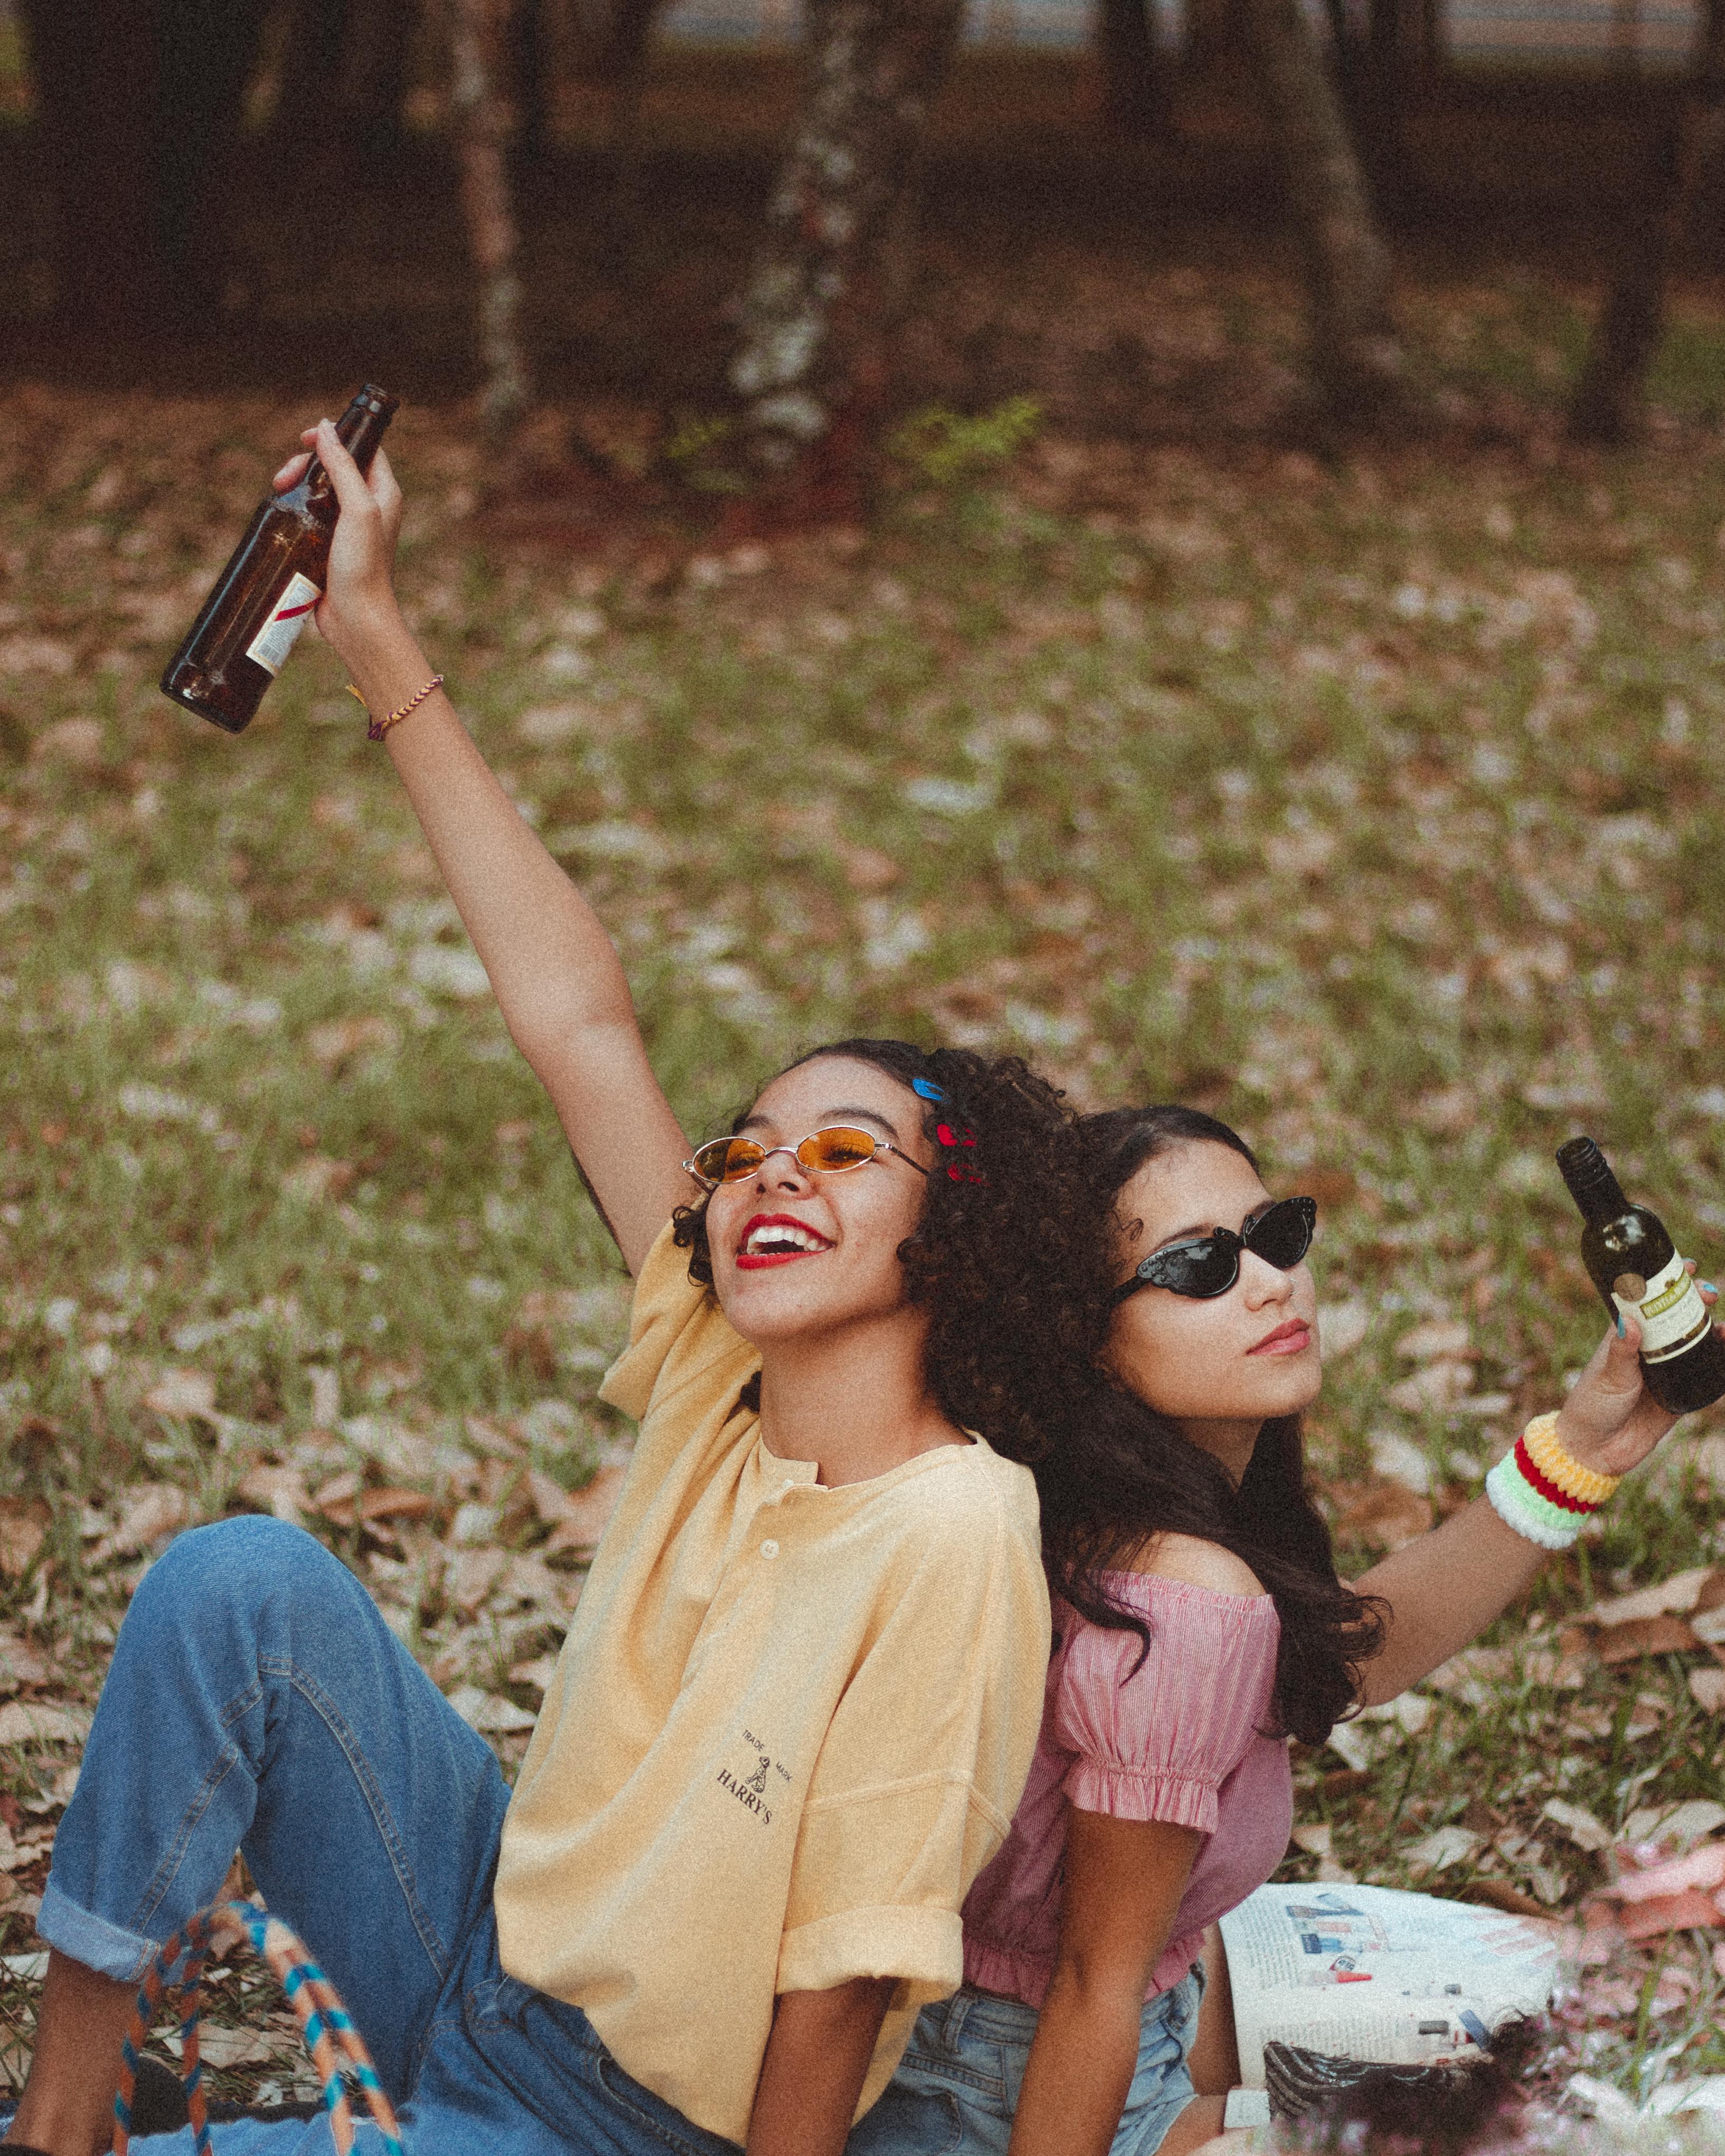 two smiling women holding bottle sitting on green grass field